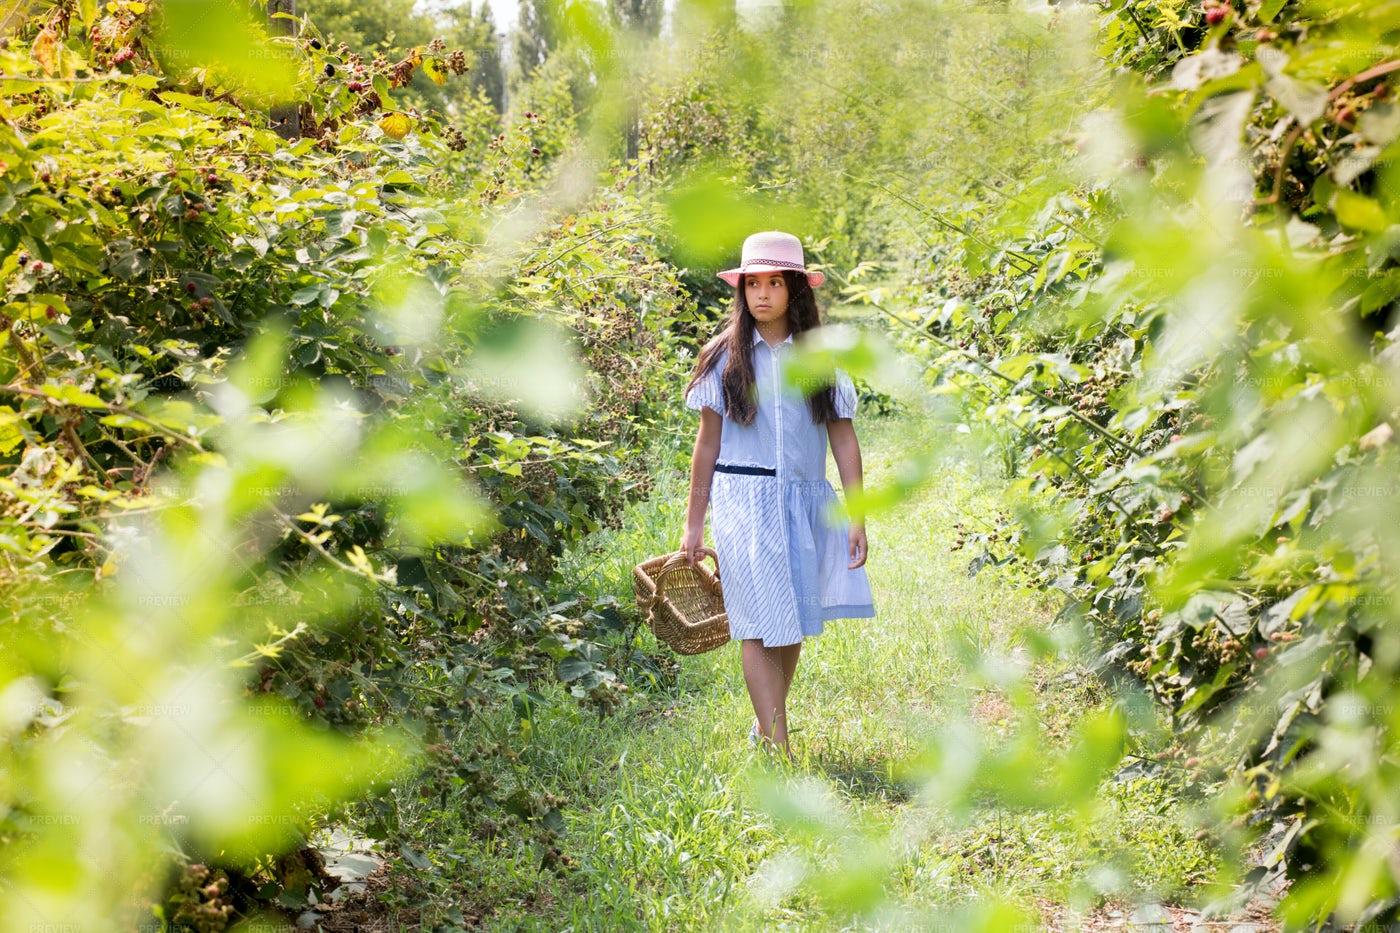 Girl Walking In Nature: Stock Photos